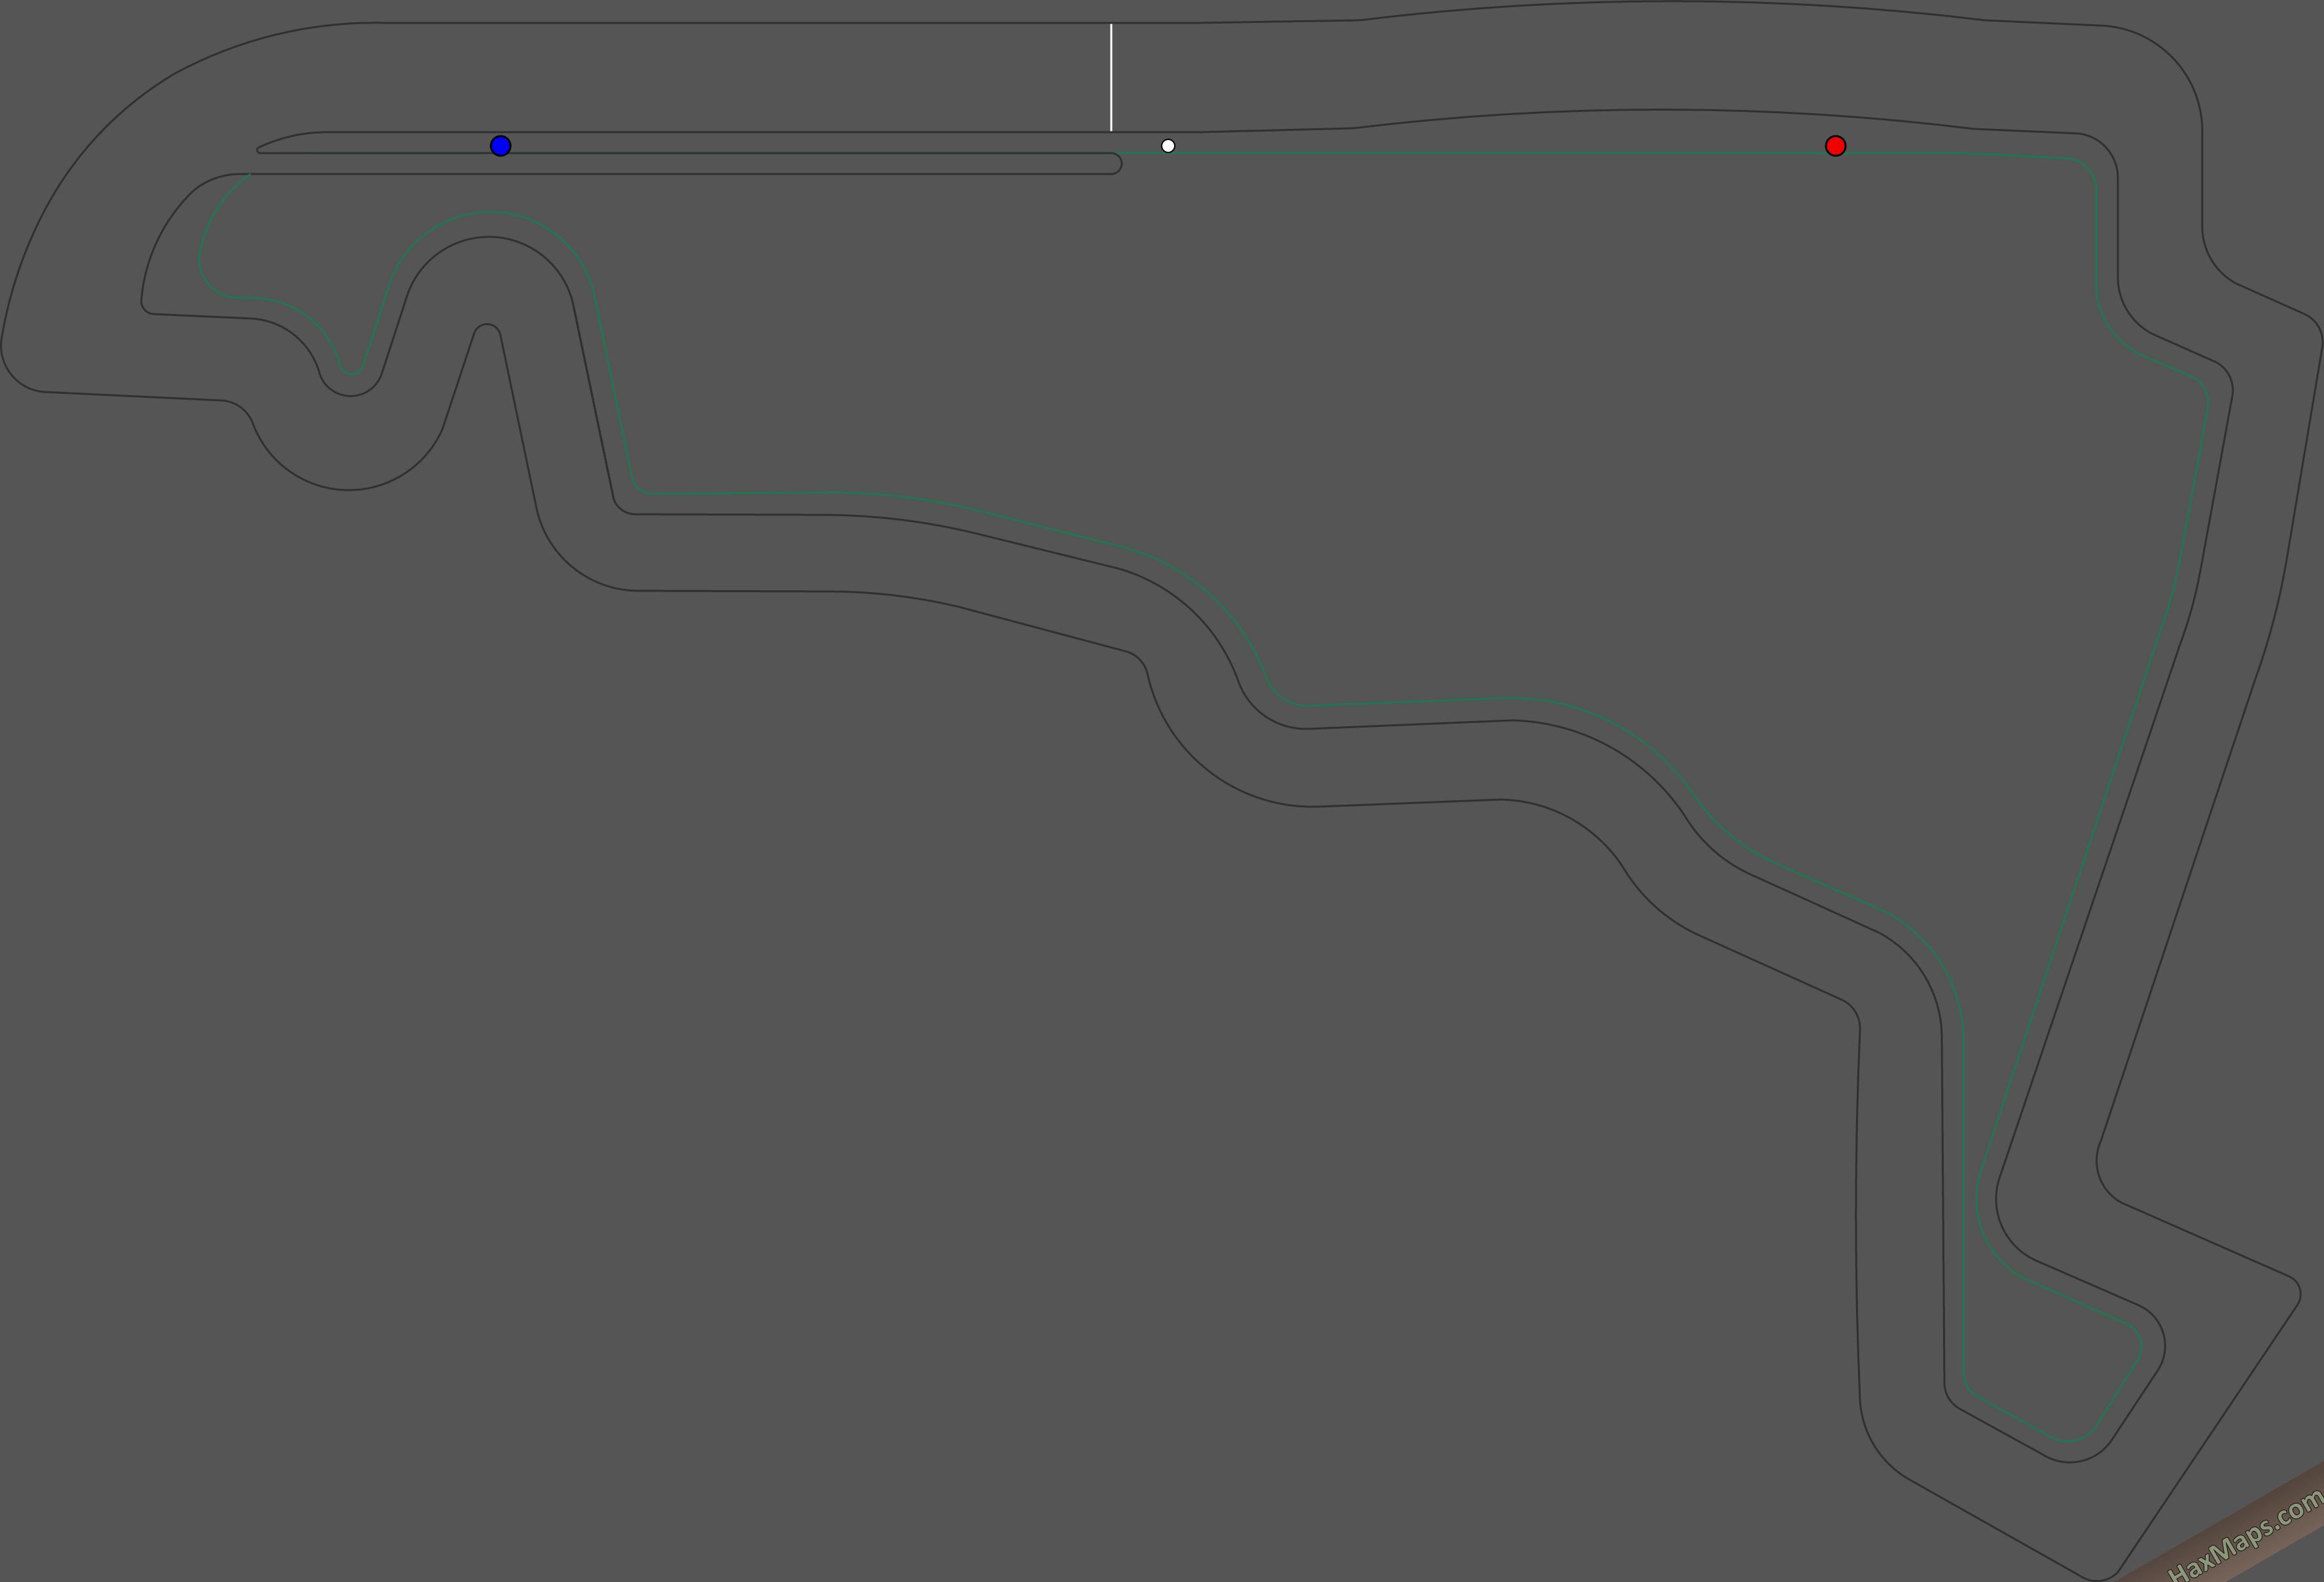 hax ball maps | Q Mexico City - Autodromo Hermanos Rodriguez by POPkORN